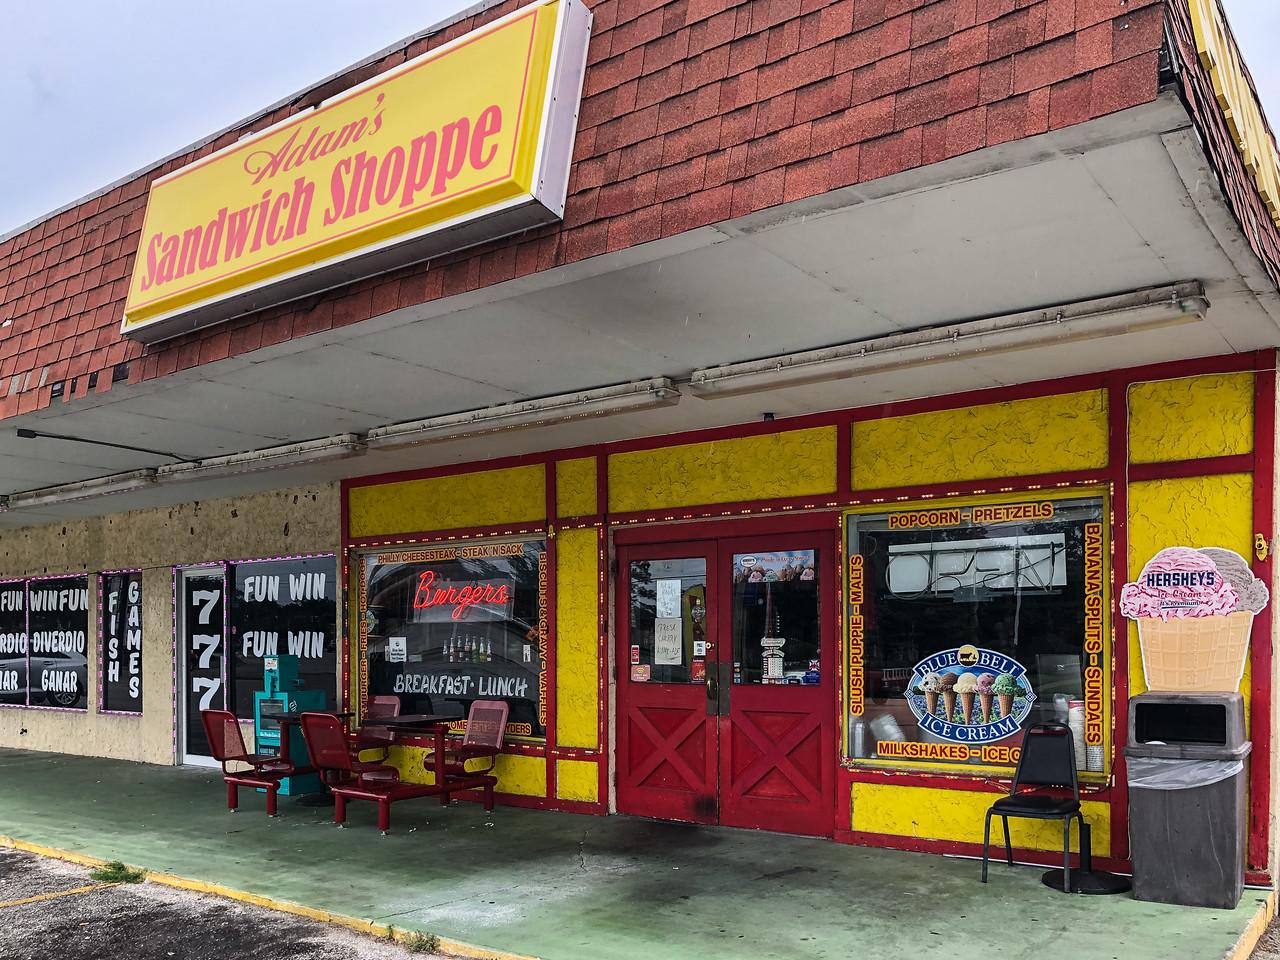 Adam's Sandwich Shoppe